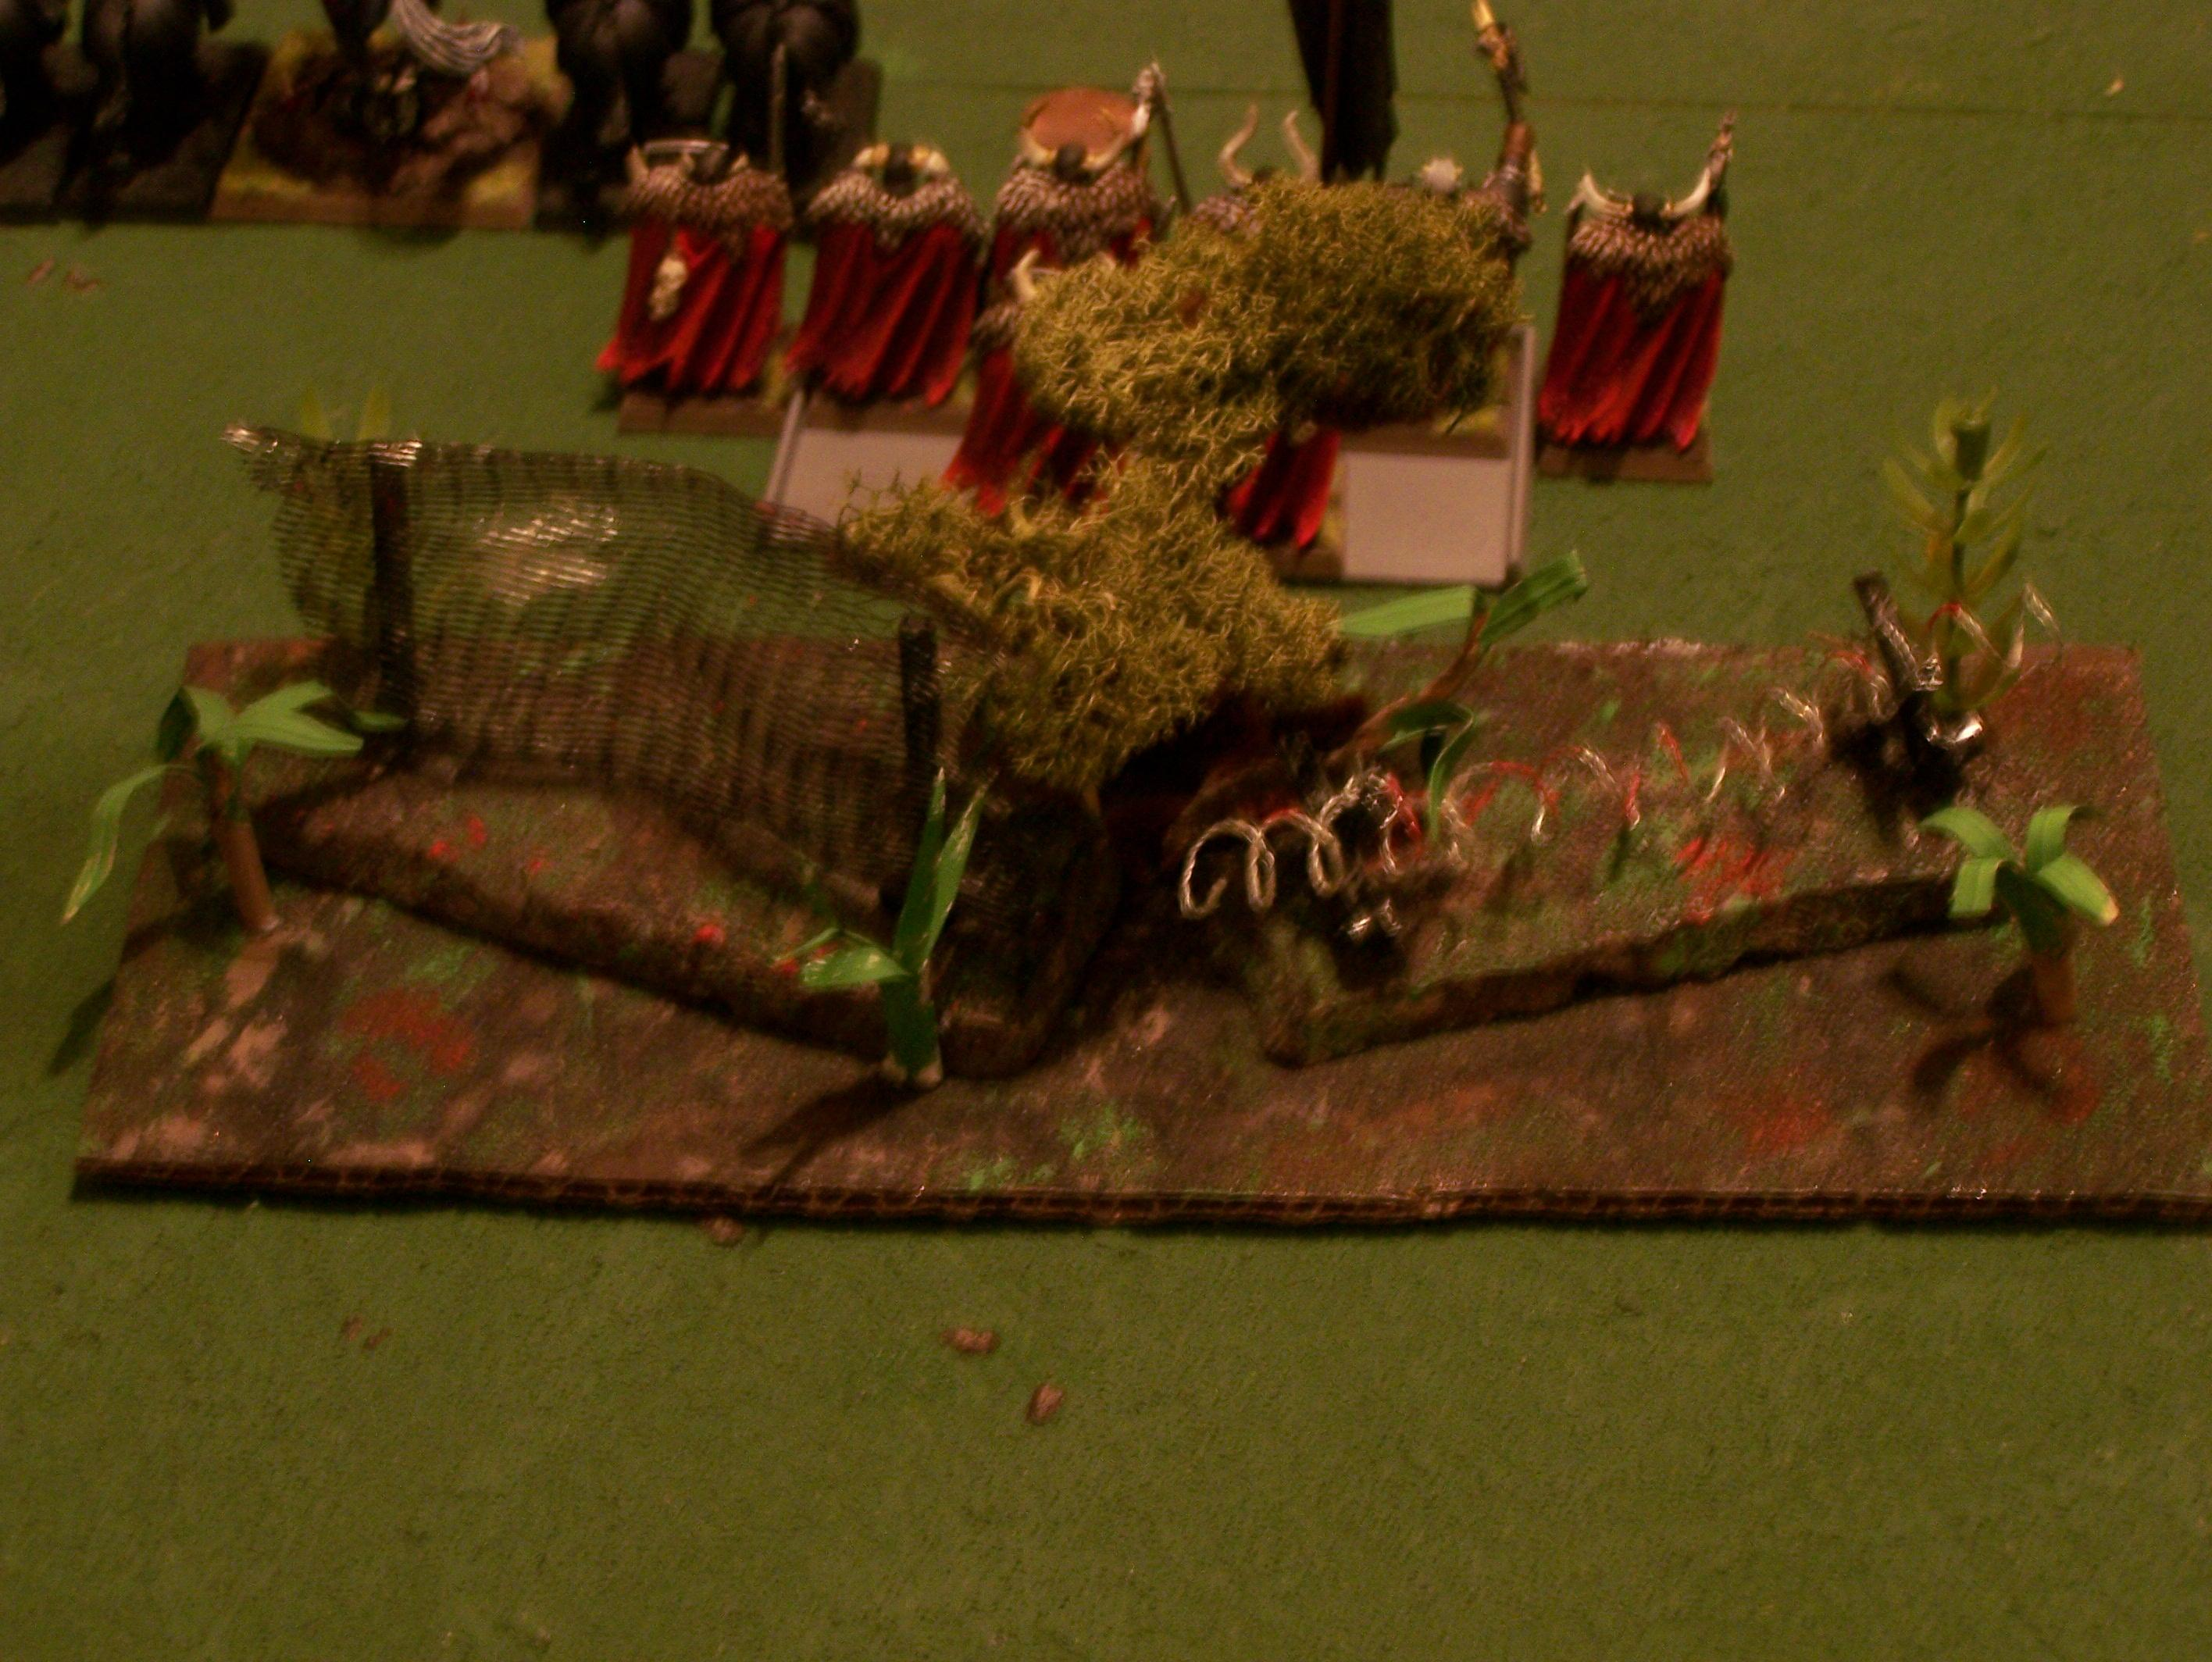 Blurred Photo, Fortification, Terrain